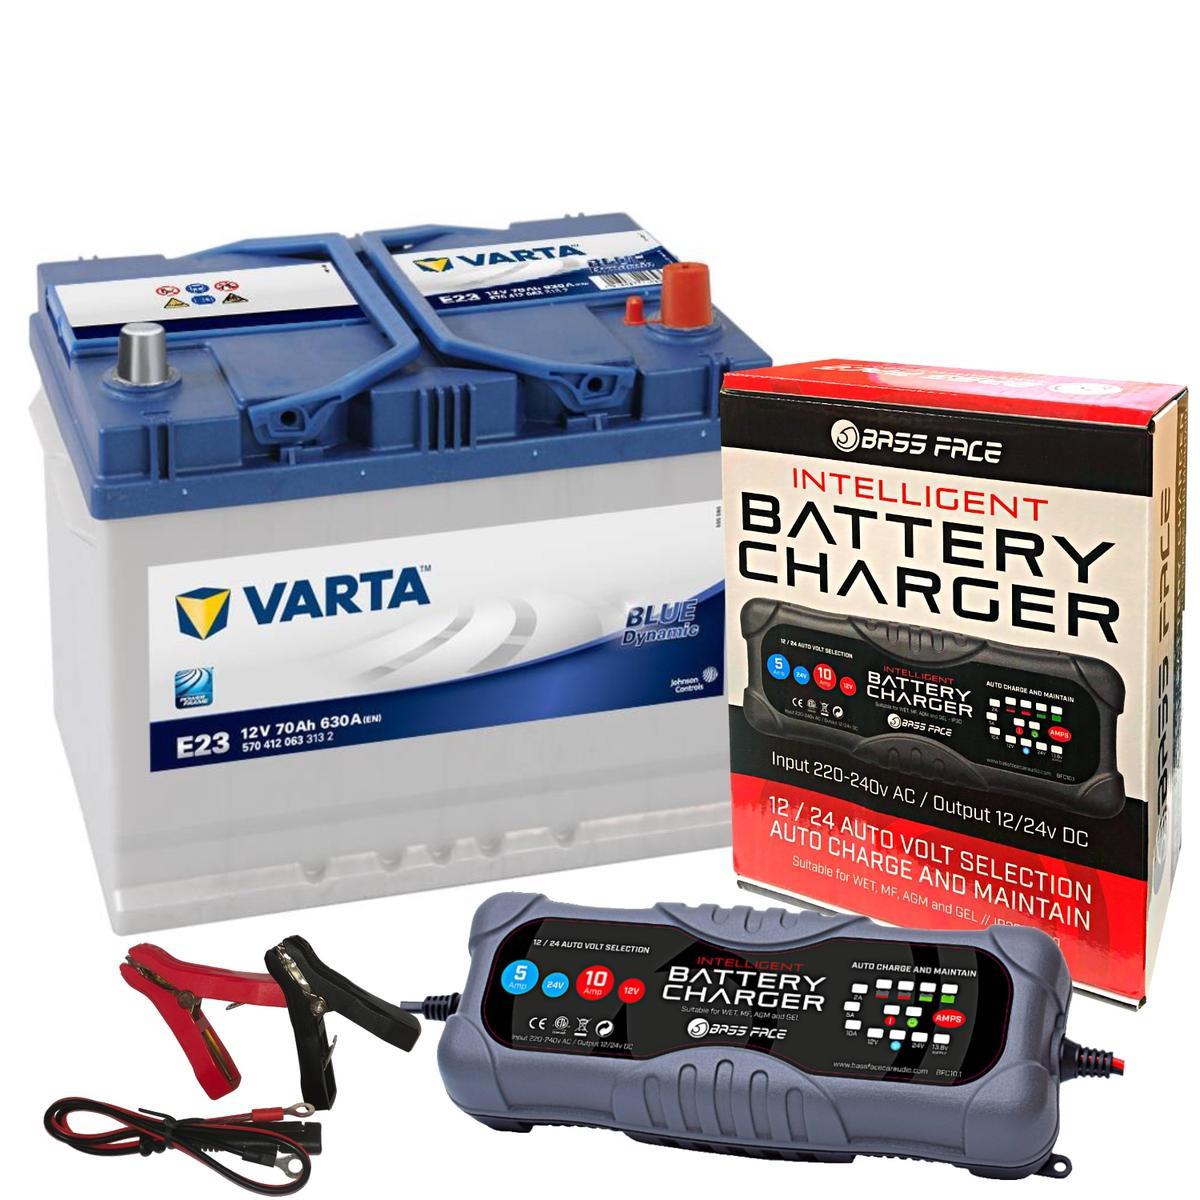 Varta E23 Alfa Nissan Car Battery 12v 4 Year 068 70Ah 630CCA W/ 10 Amp Charger